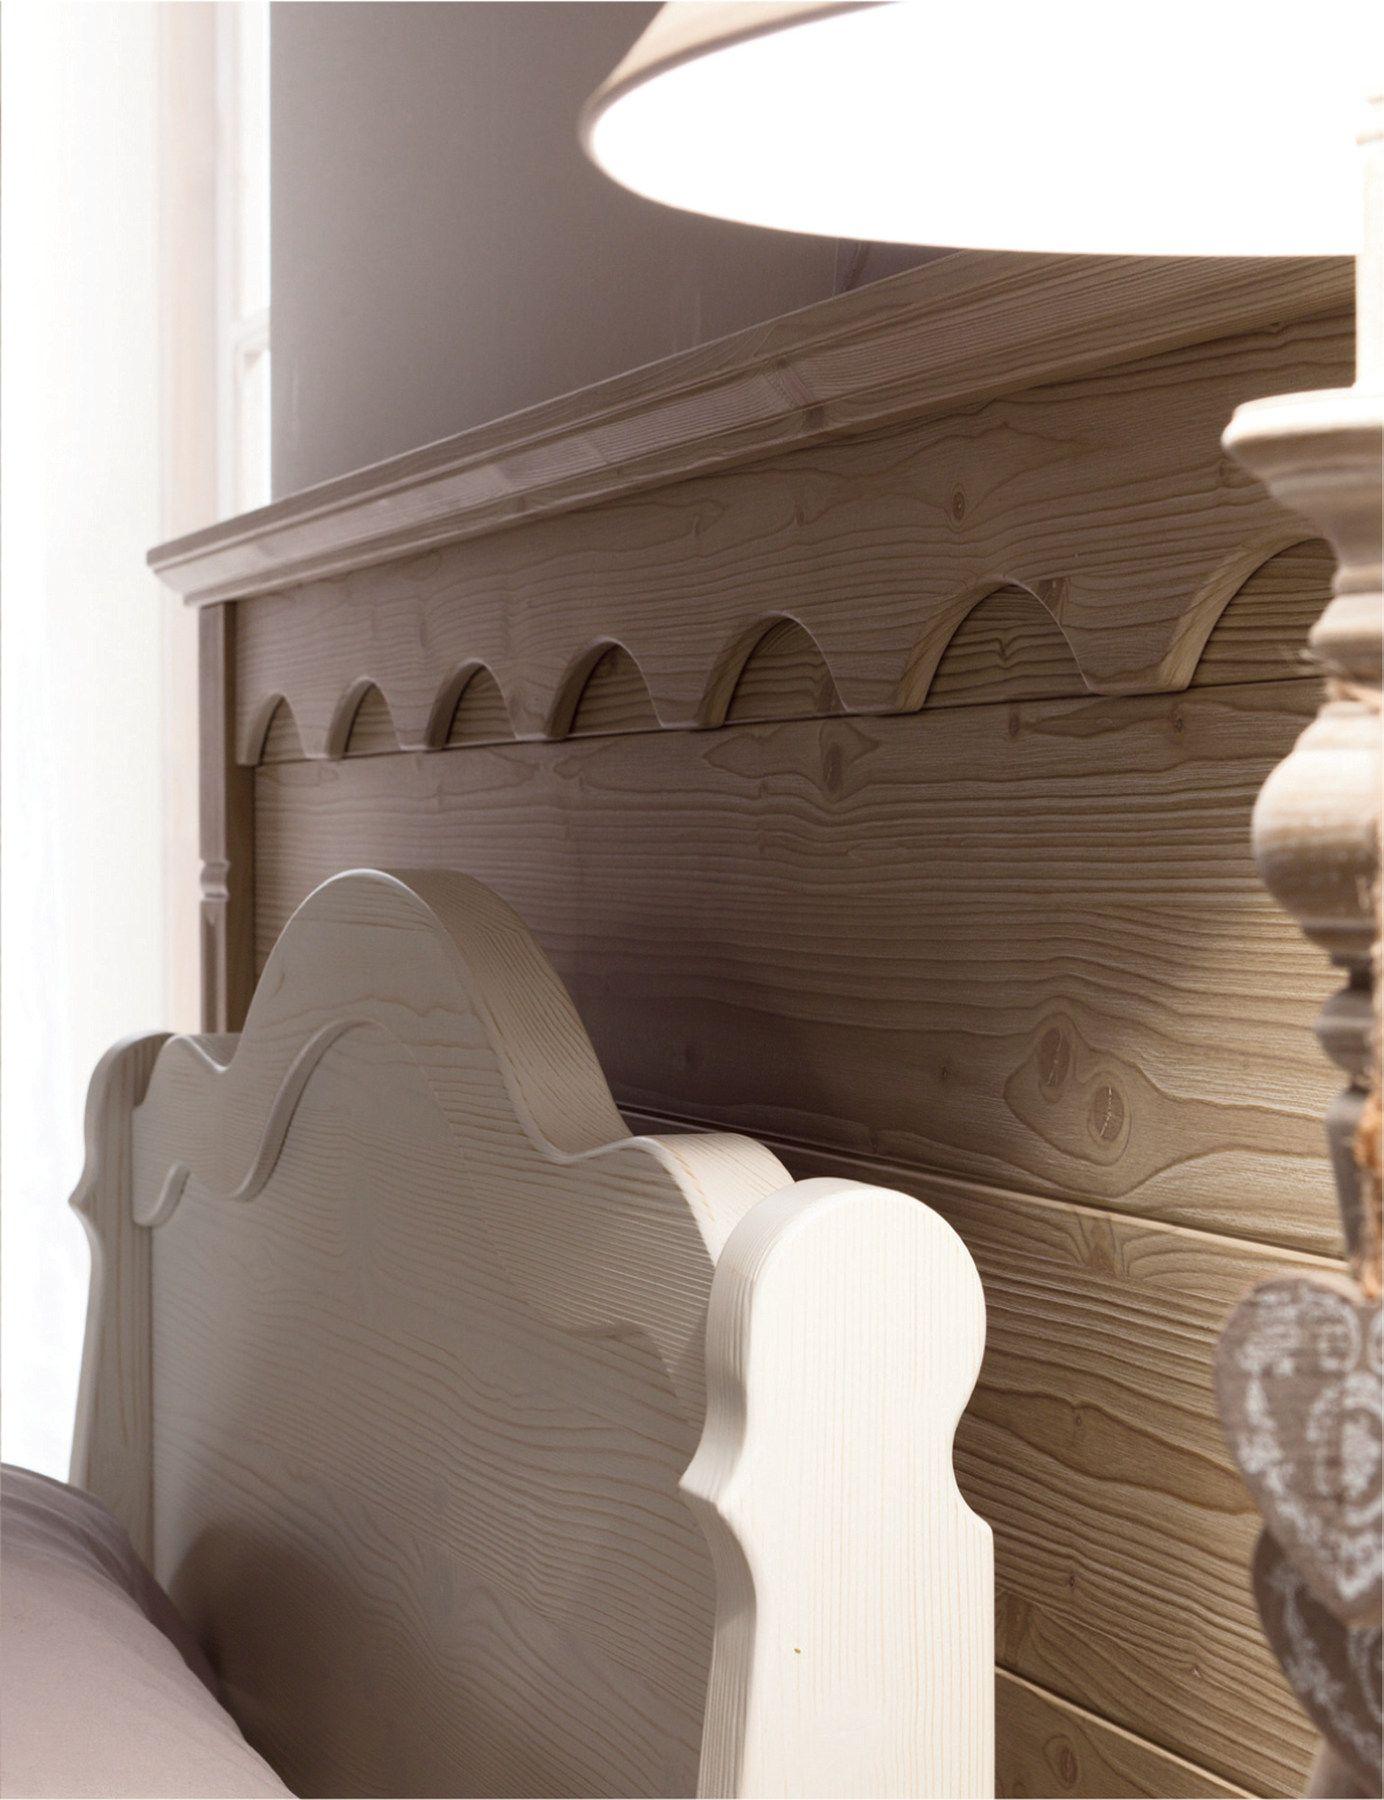 Wooden bedroom set for boys girls tabi t05 by scandola mobili for Scandola mobili